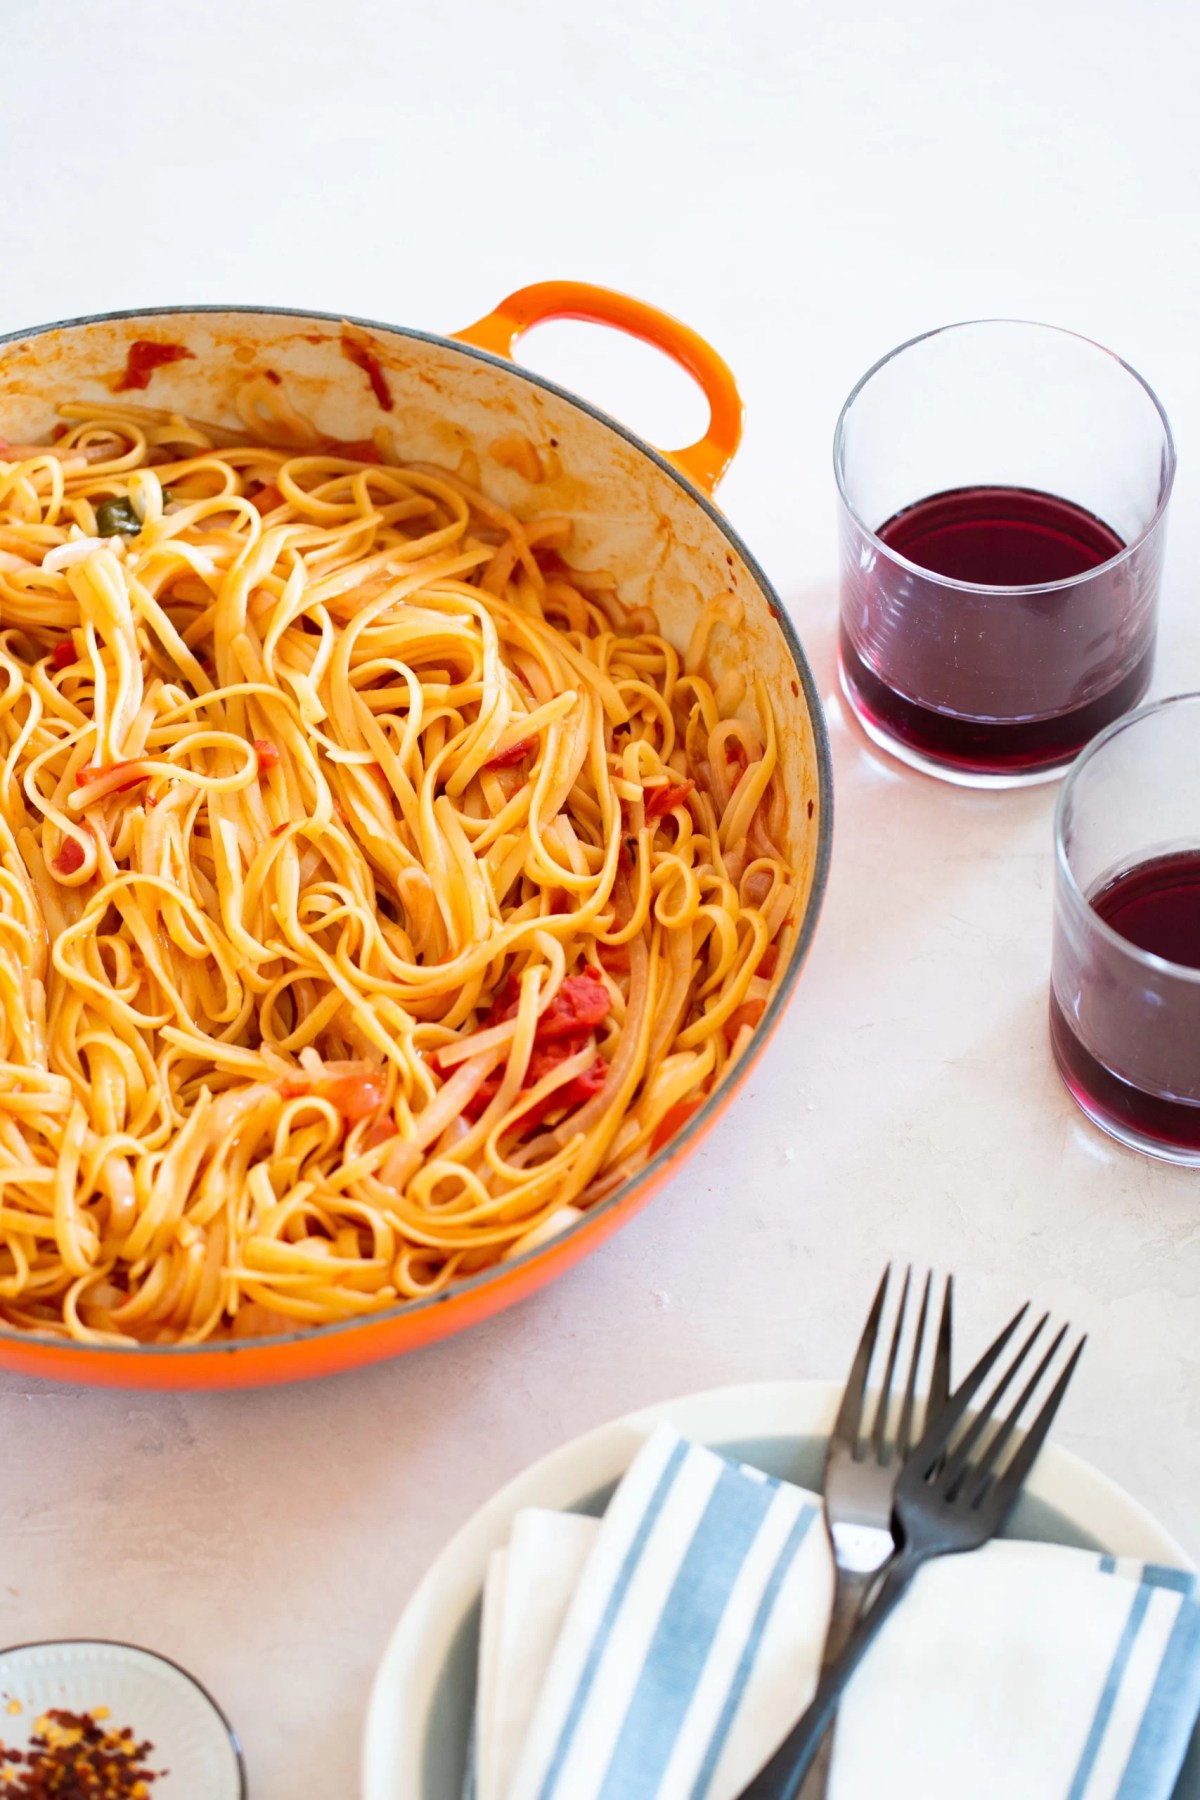 PAsta con tomate en un sarten con vasos de vino tinto